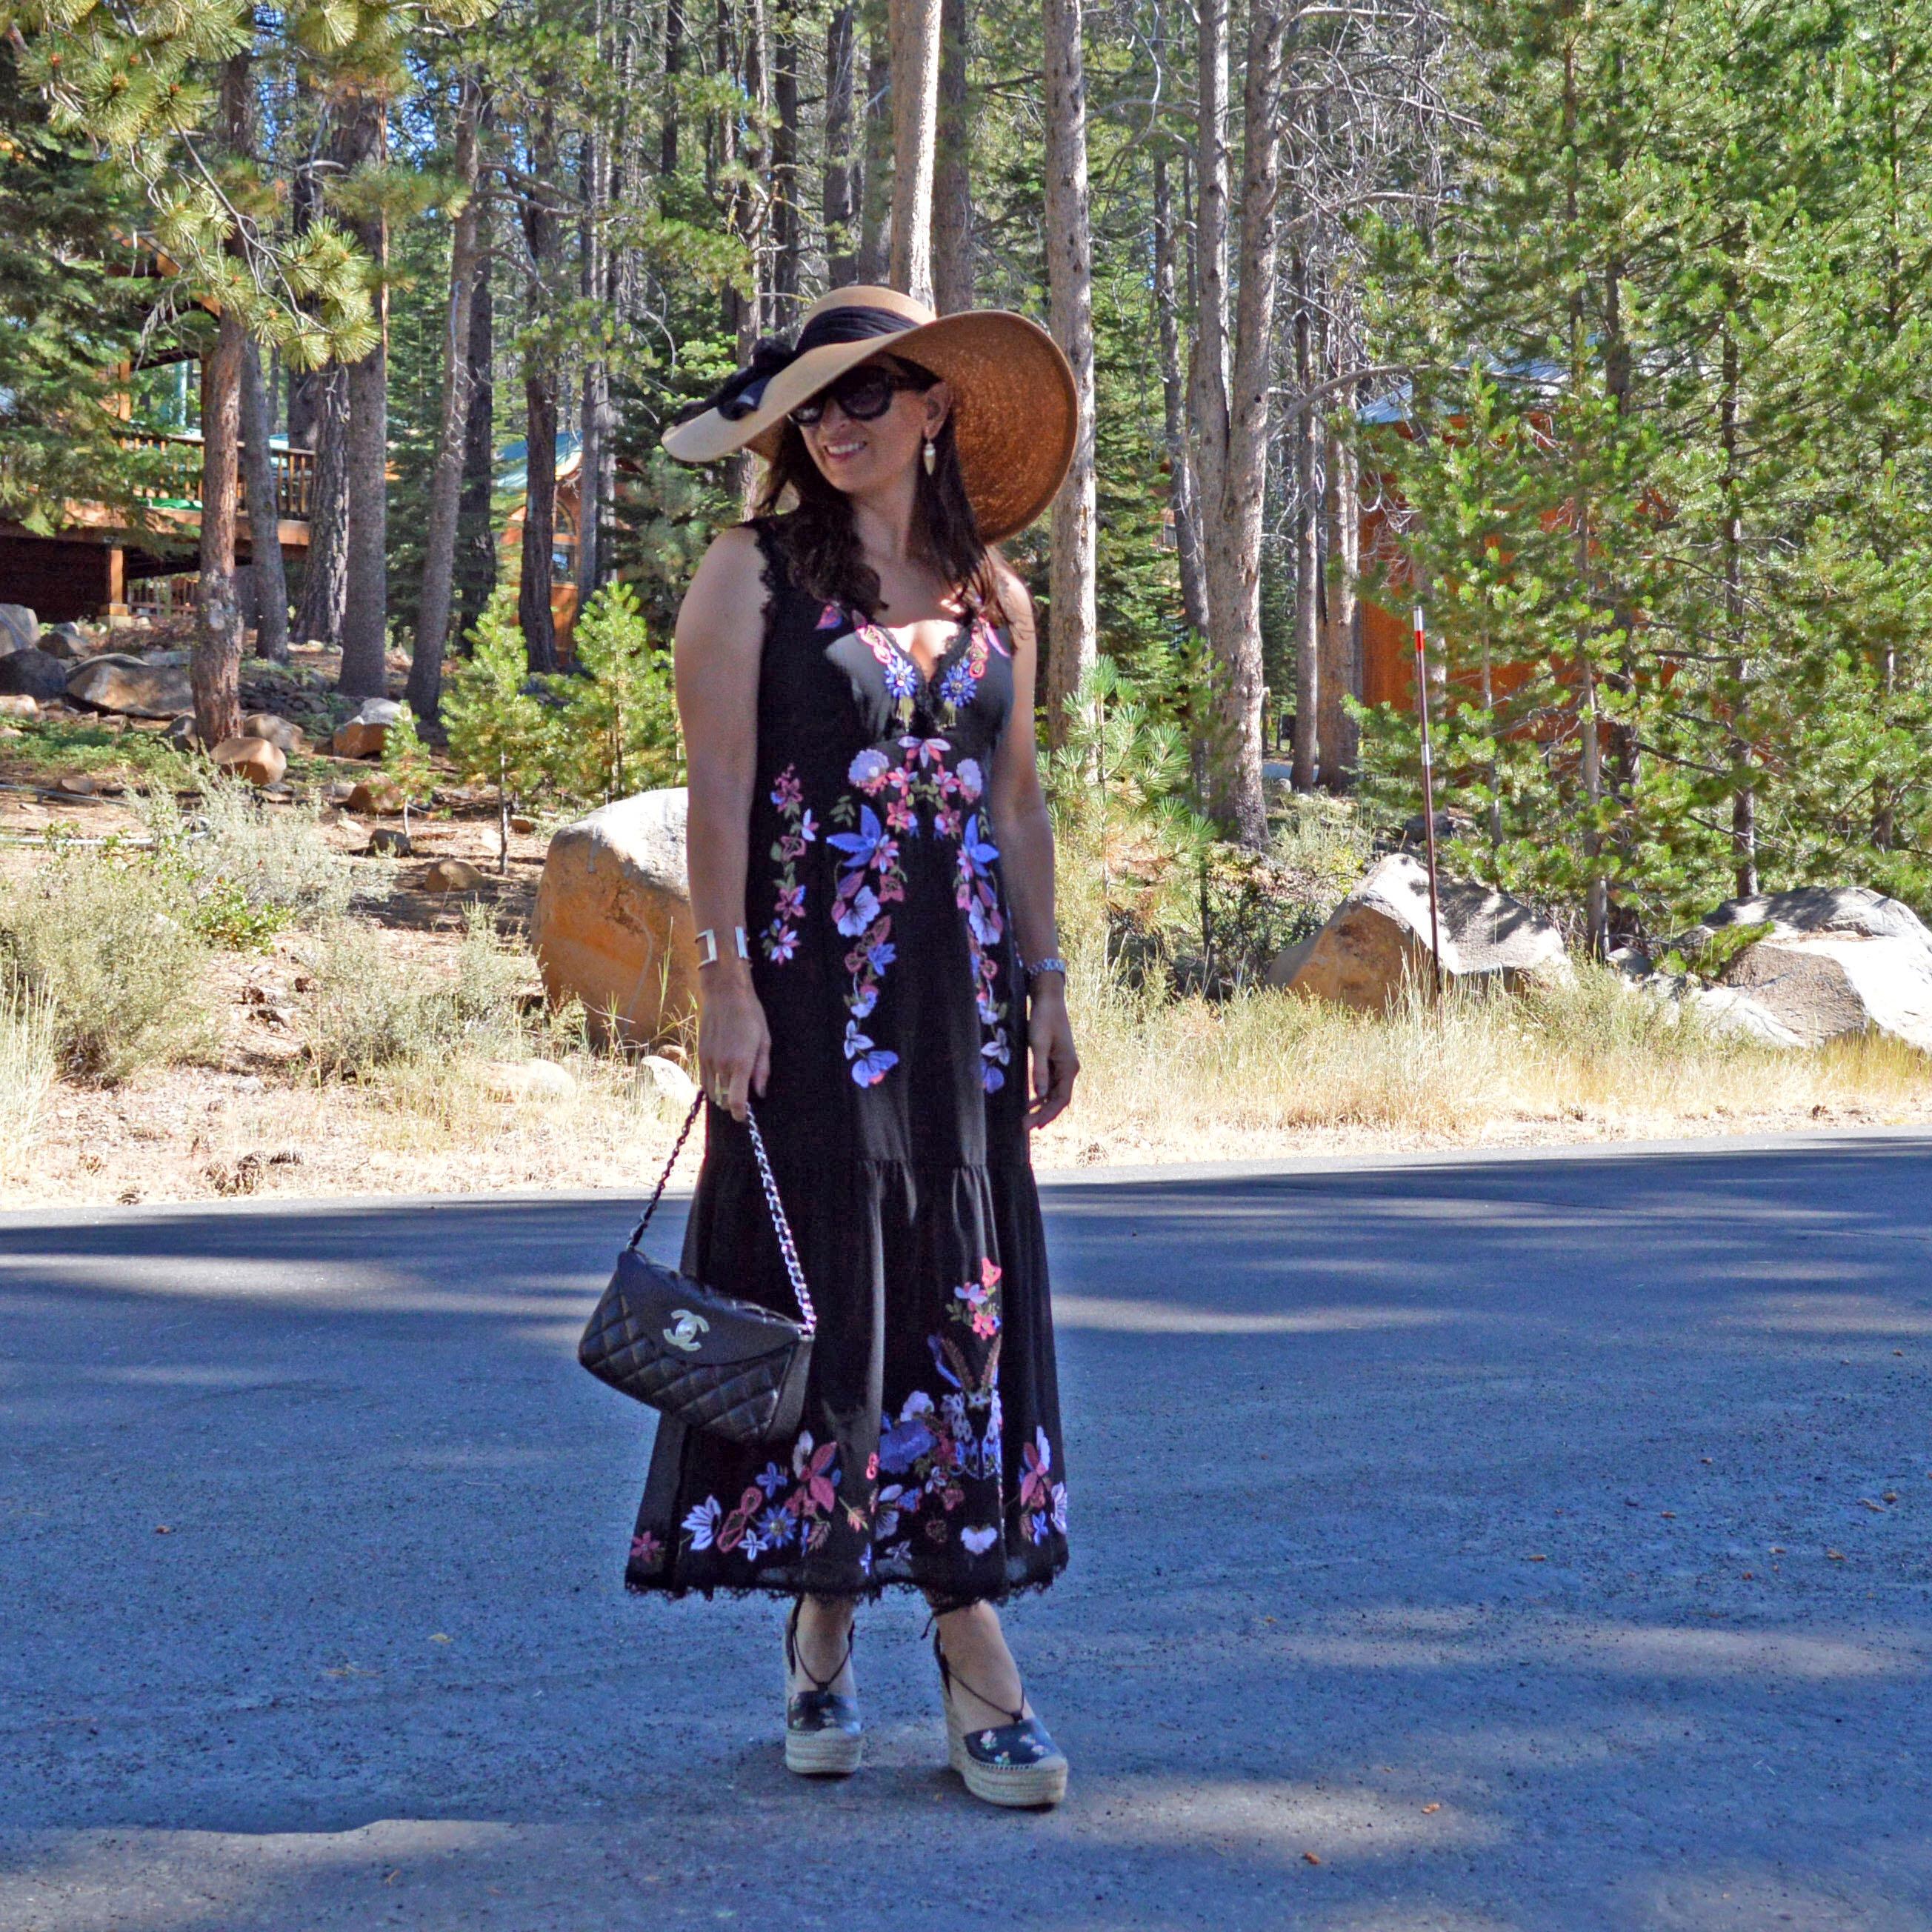 how to dress for an outdoor summer fundraiser